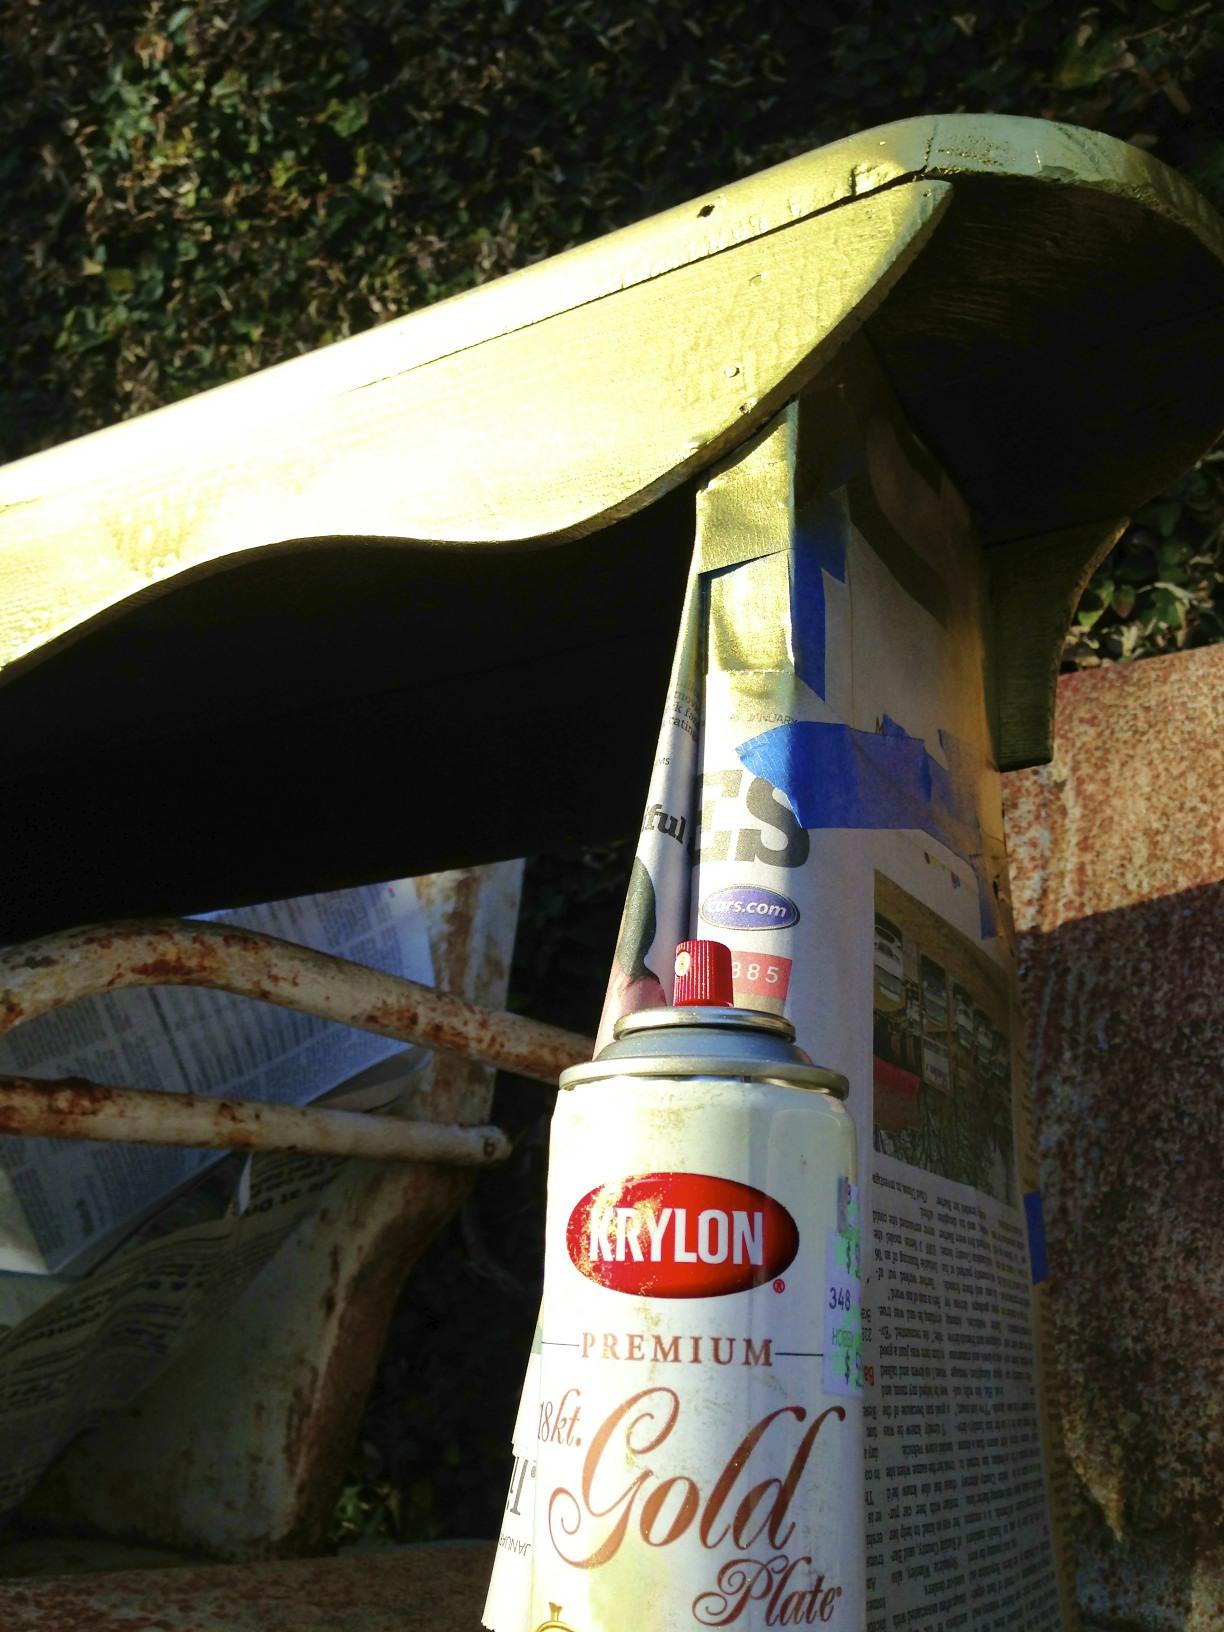 Krylon gold spray paint